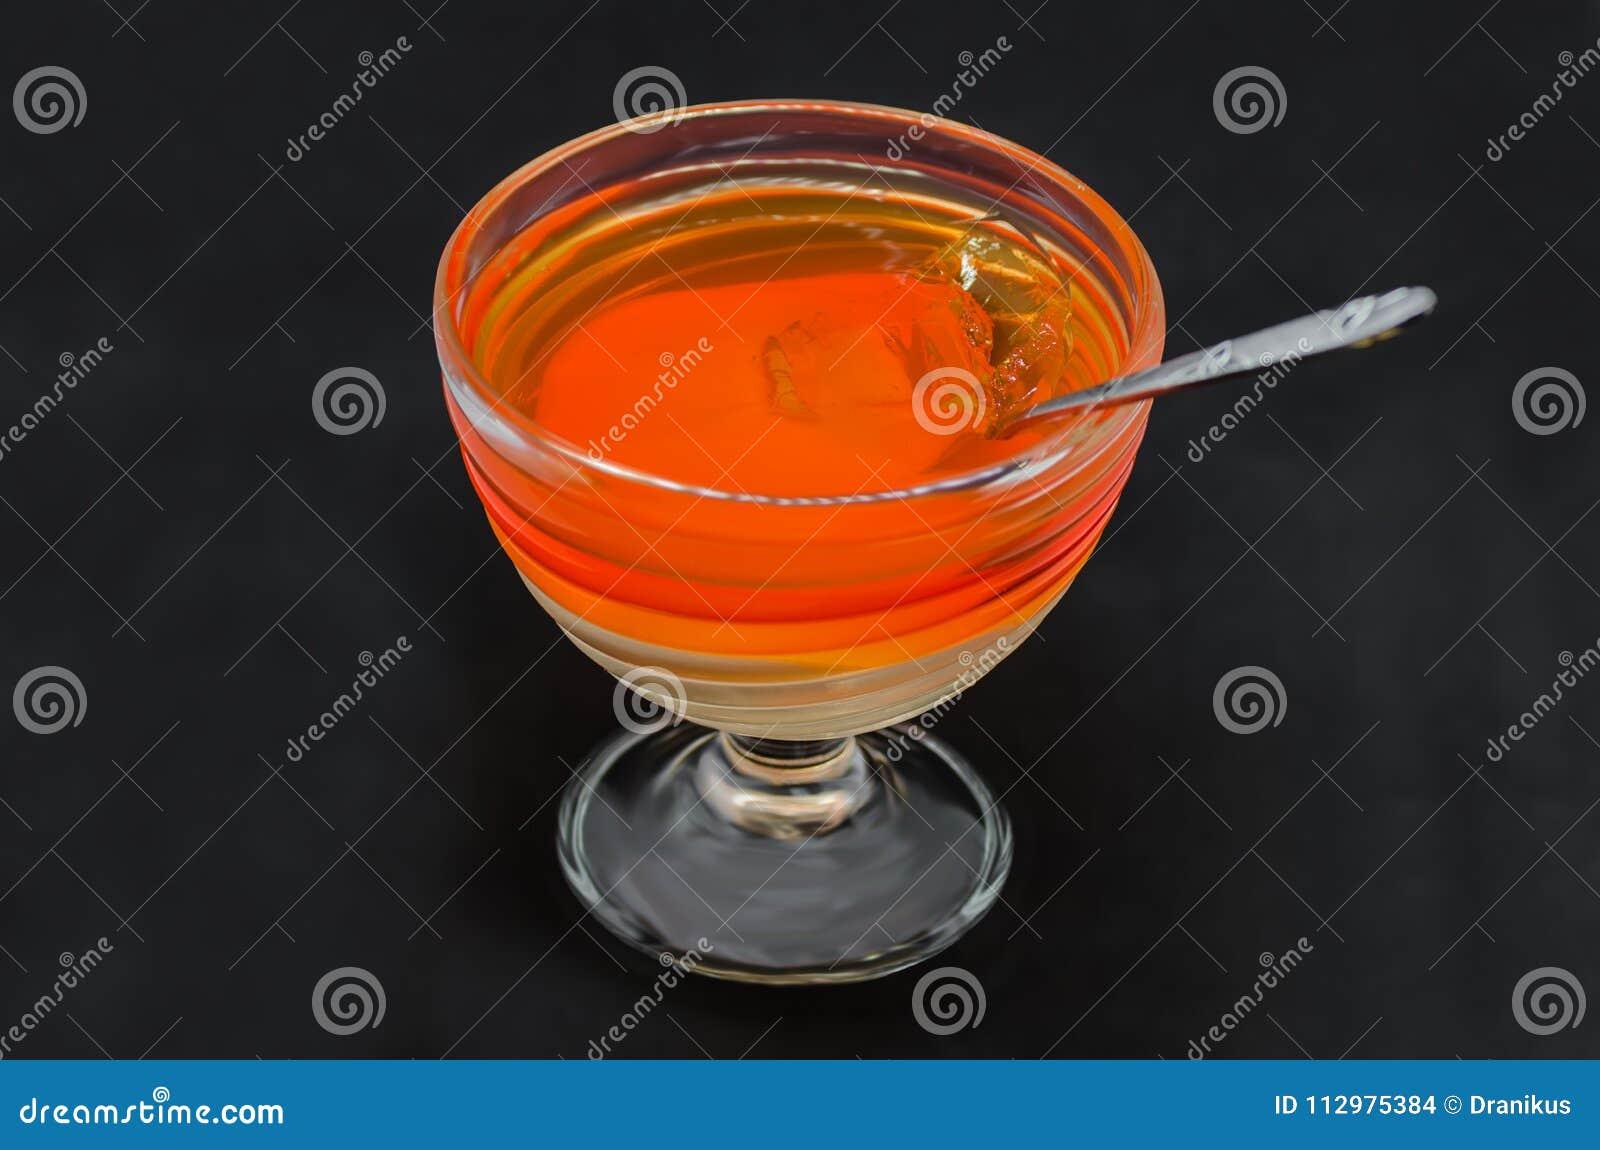 Sweet delicious dessert of multi-colored jelly in a glassware